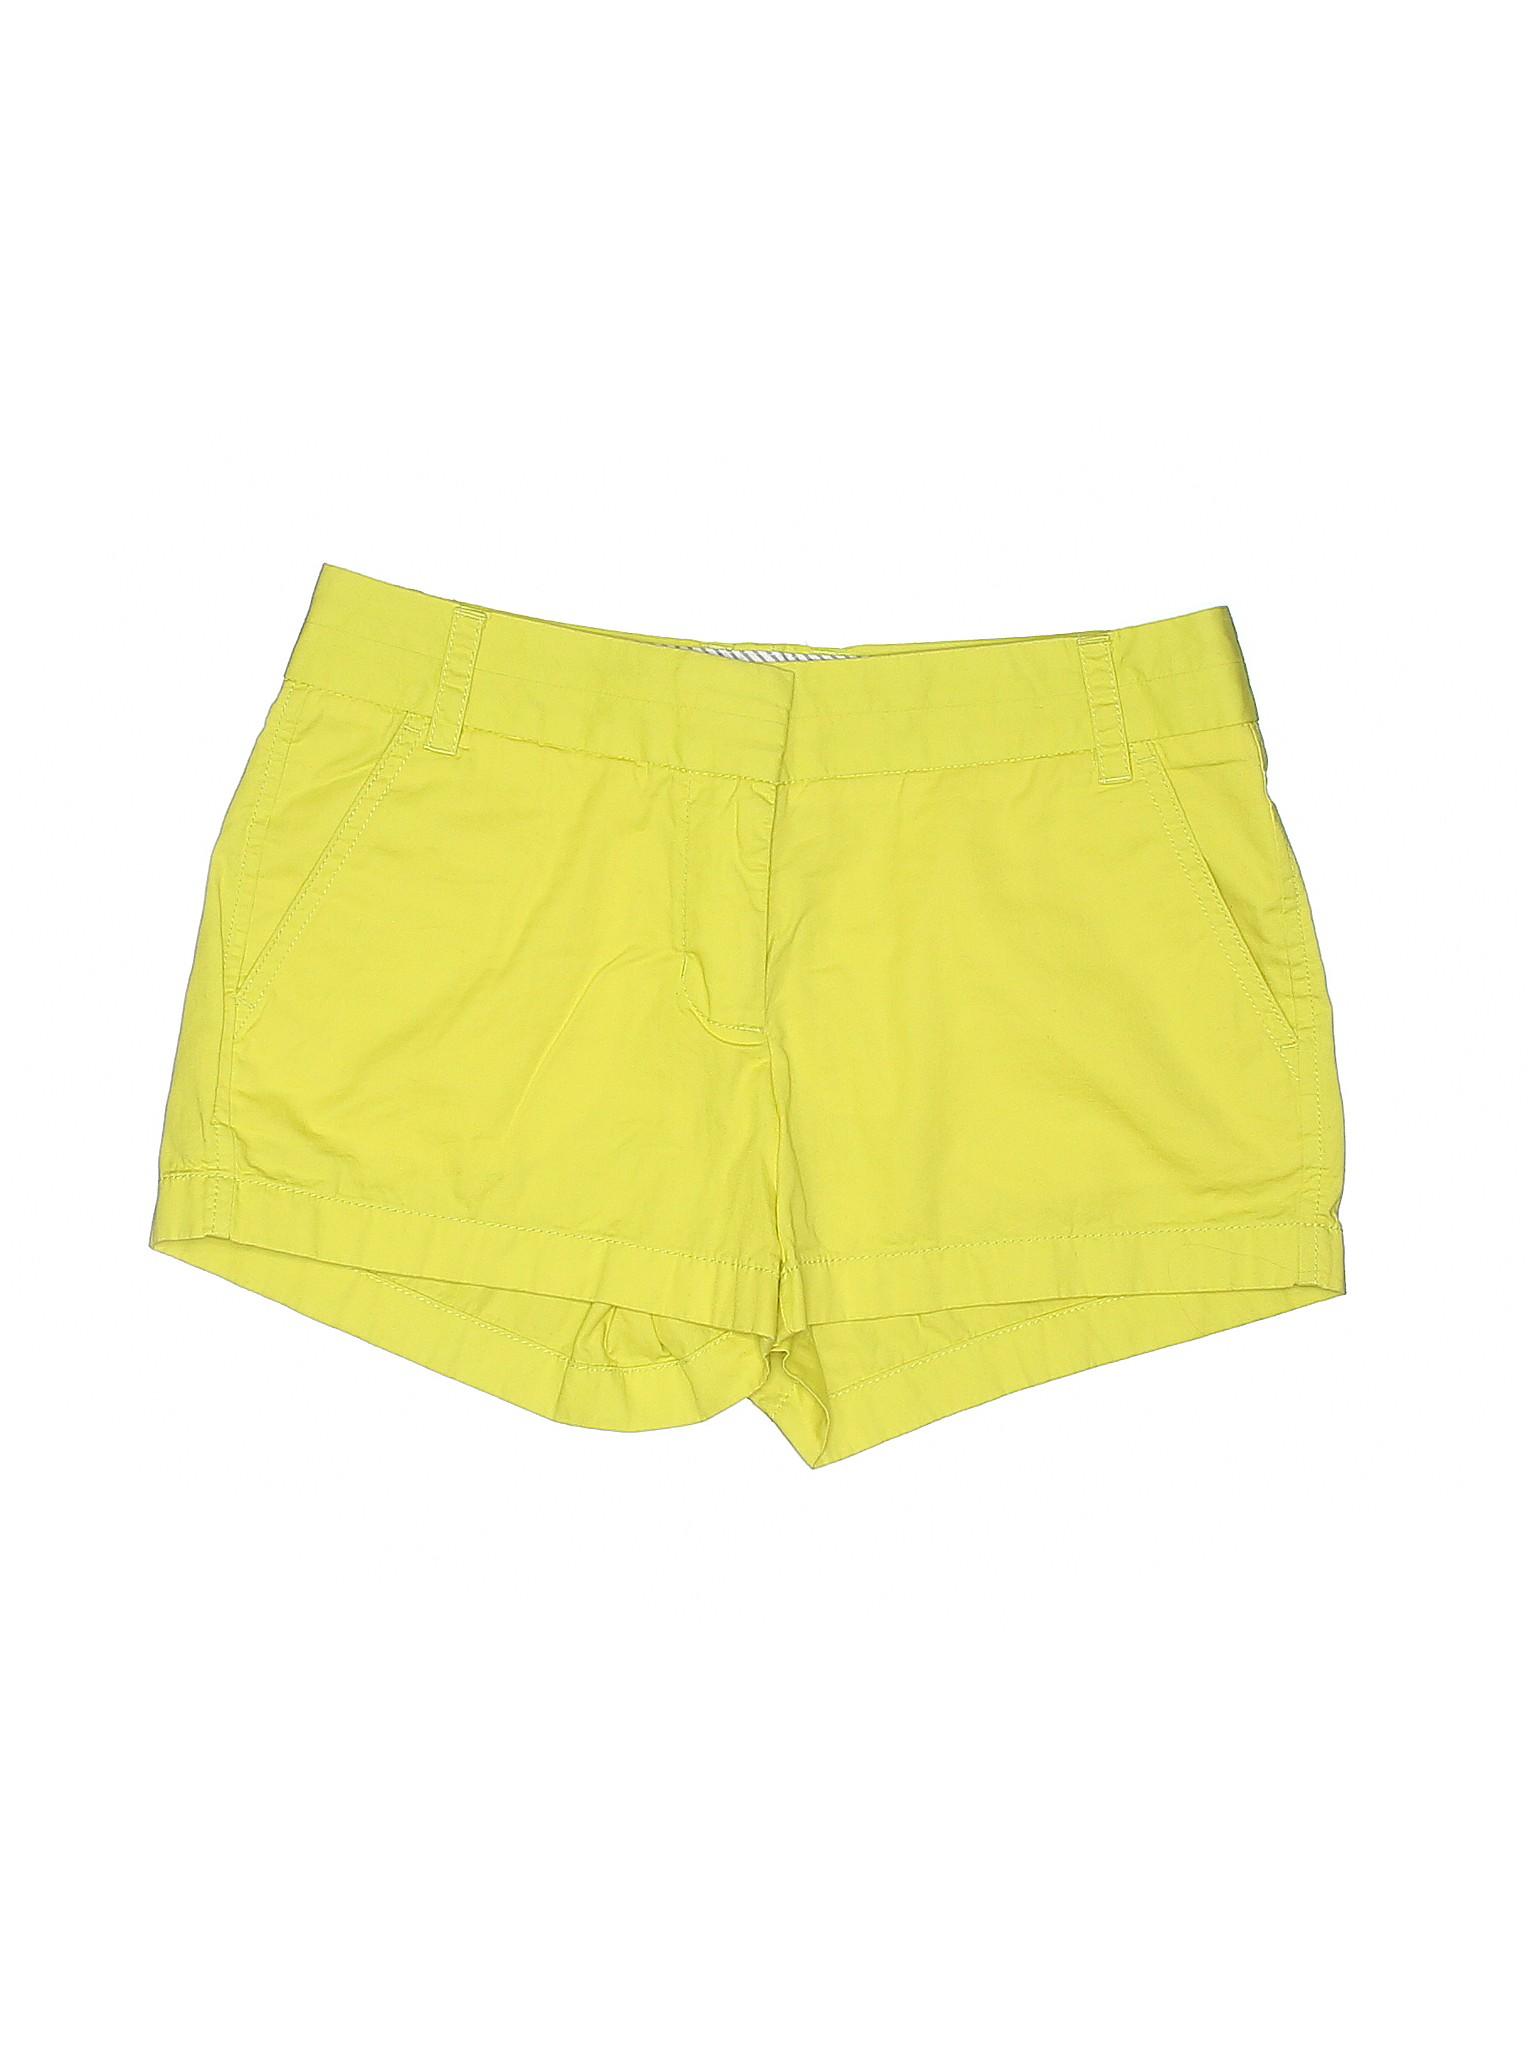 J Boutique Khaki Shorts J Shorts Crew Boutique Khaki Crew w7f61xqB